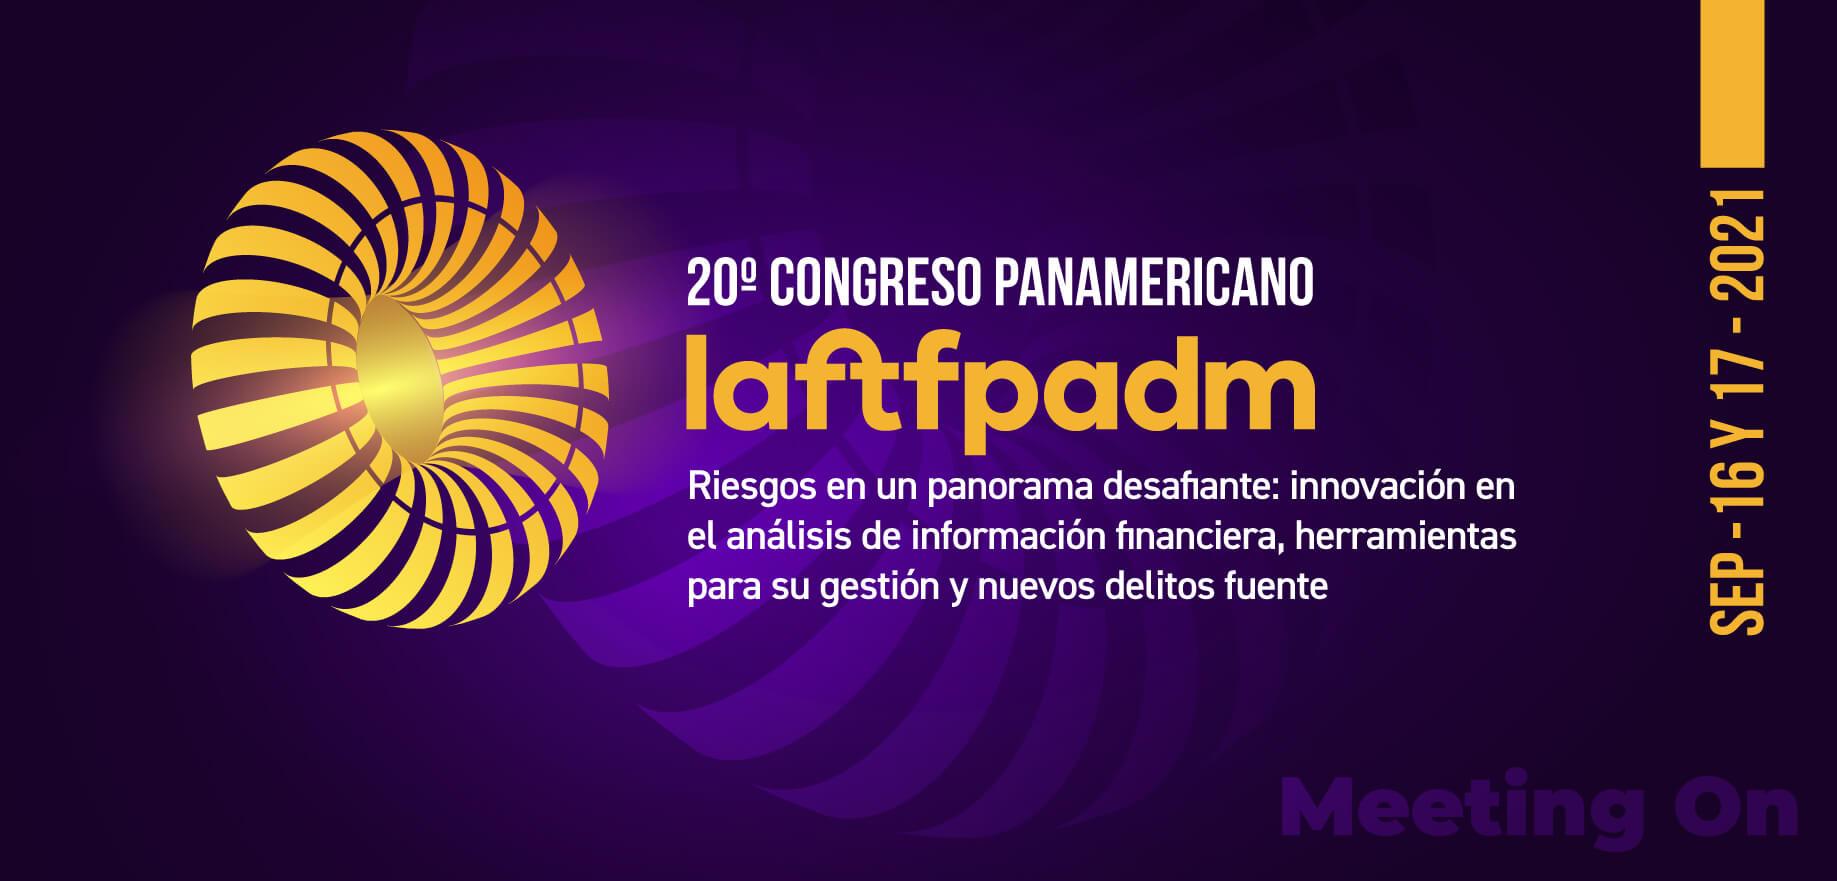 19 congreso panamericano laftfpadm asobancaria